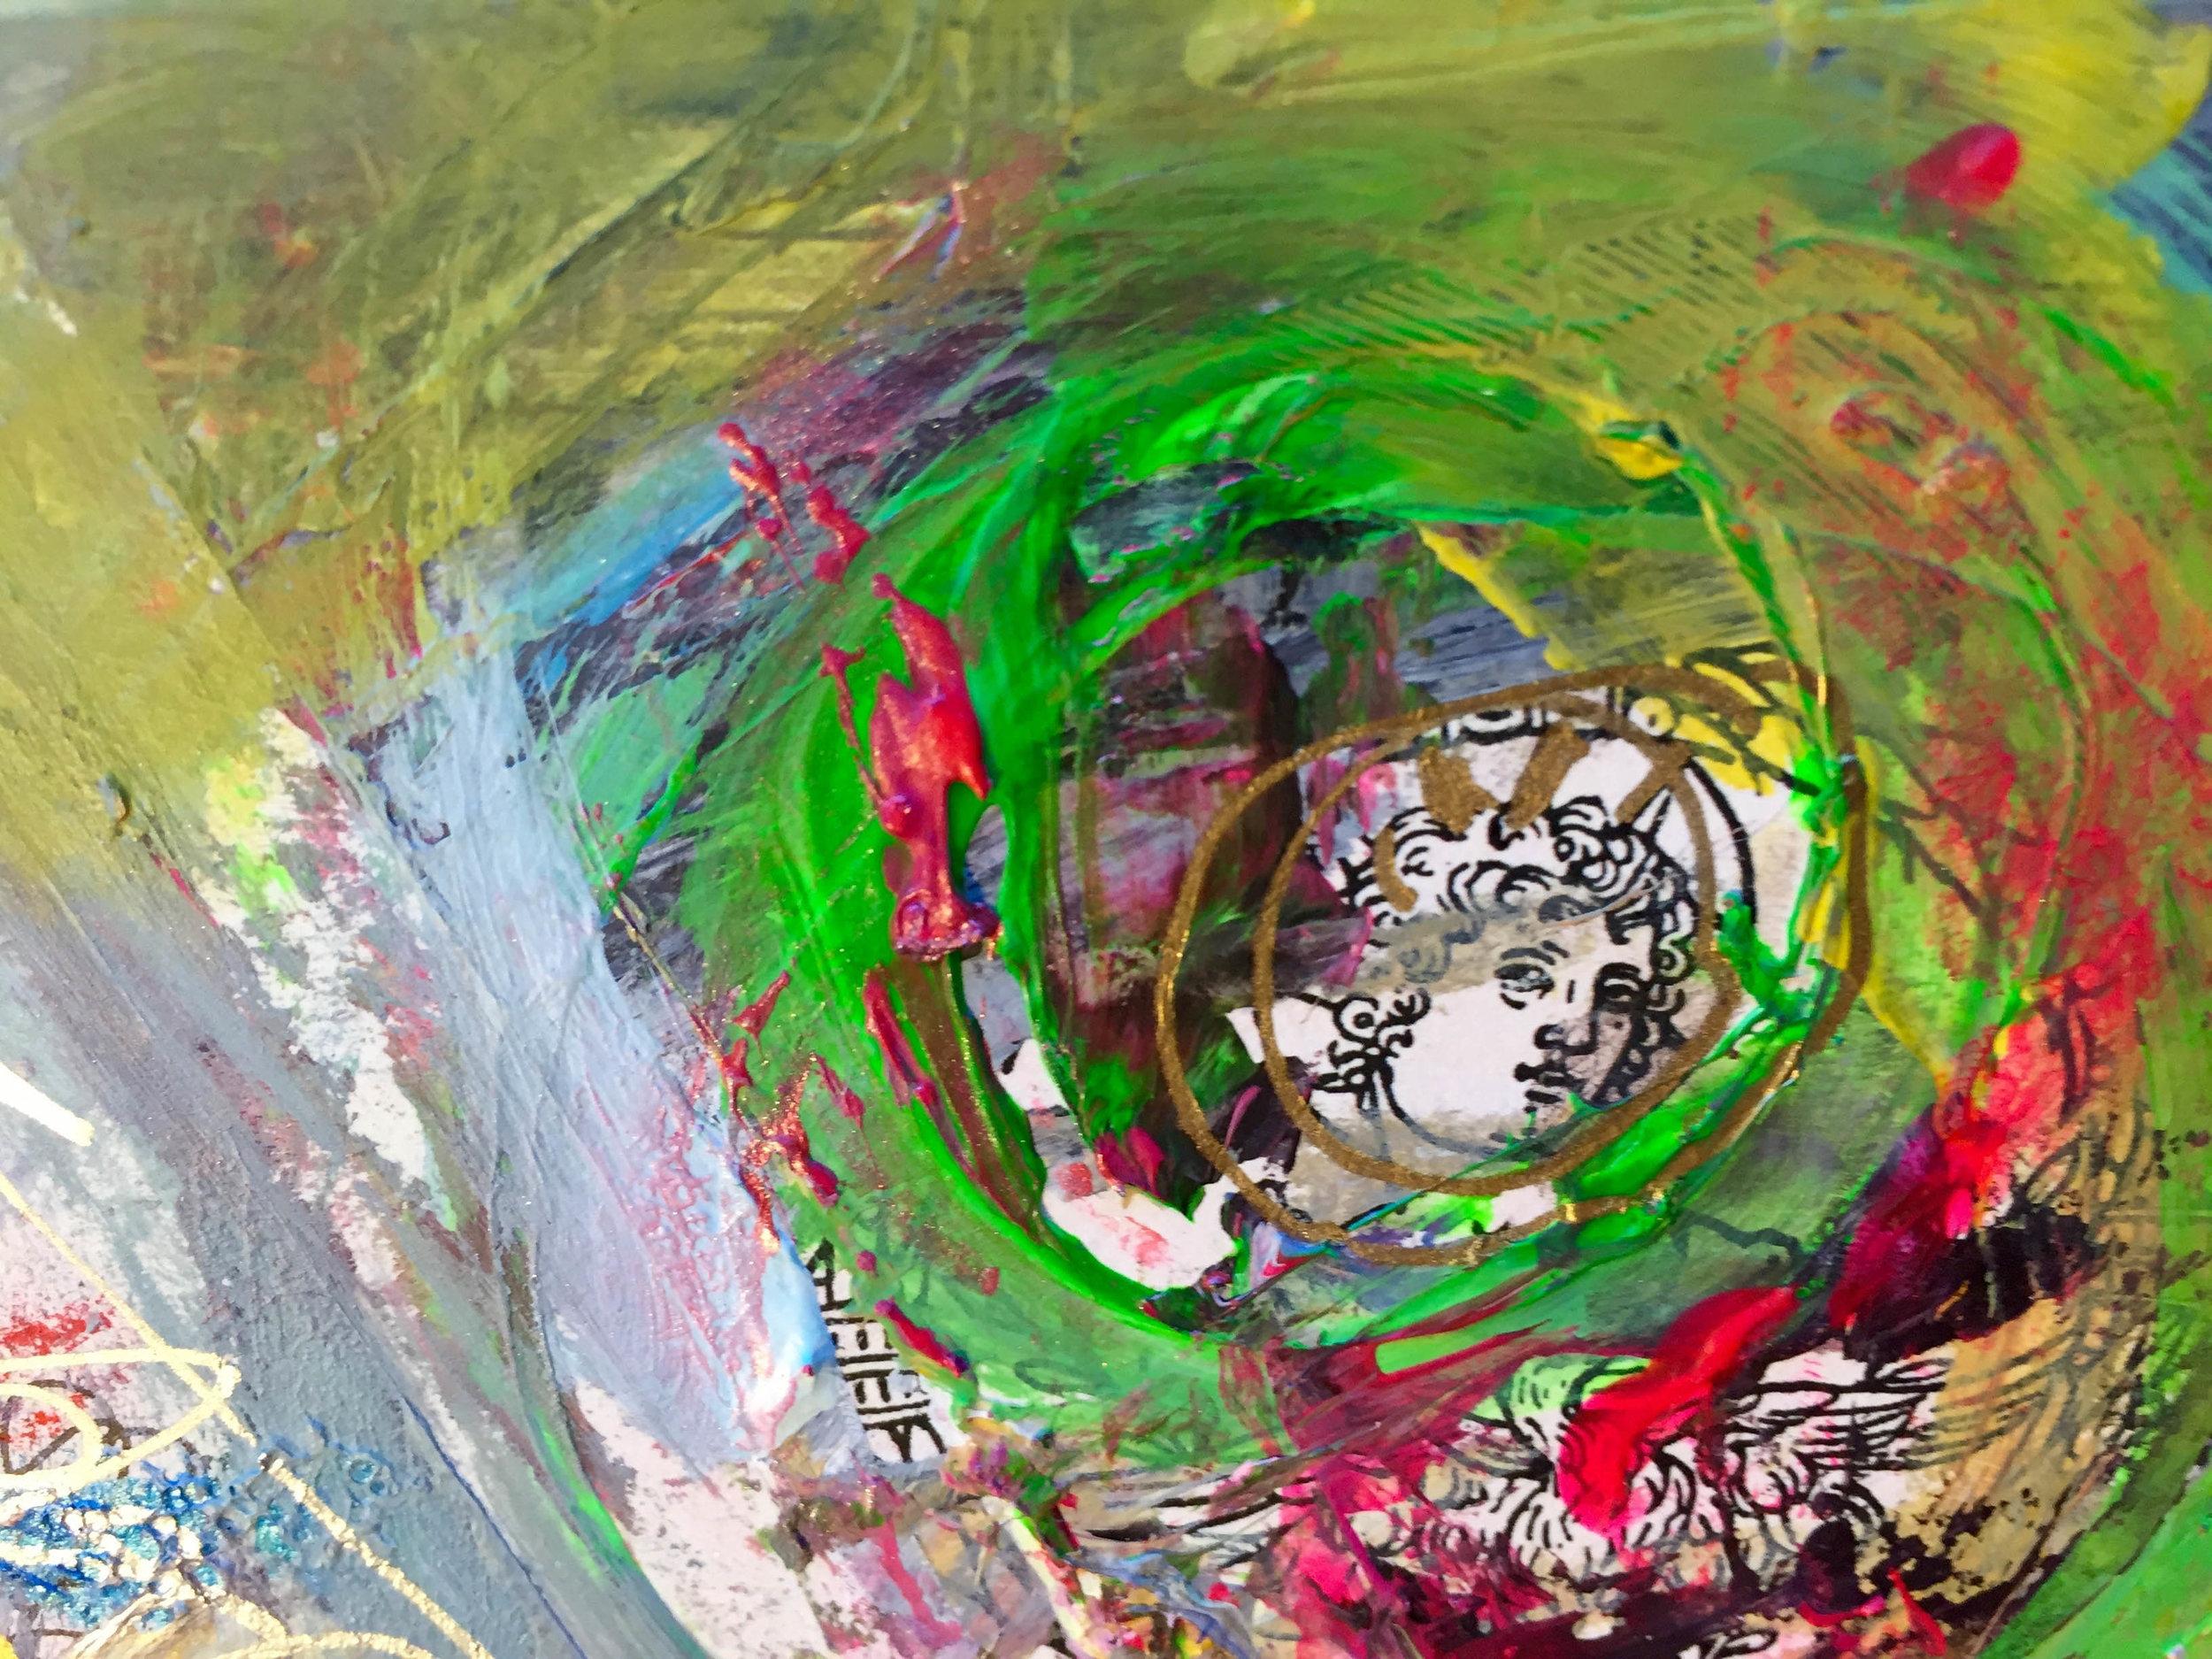 20151113-painting-8.jpg